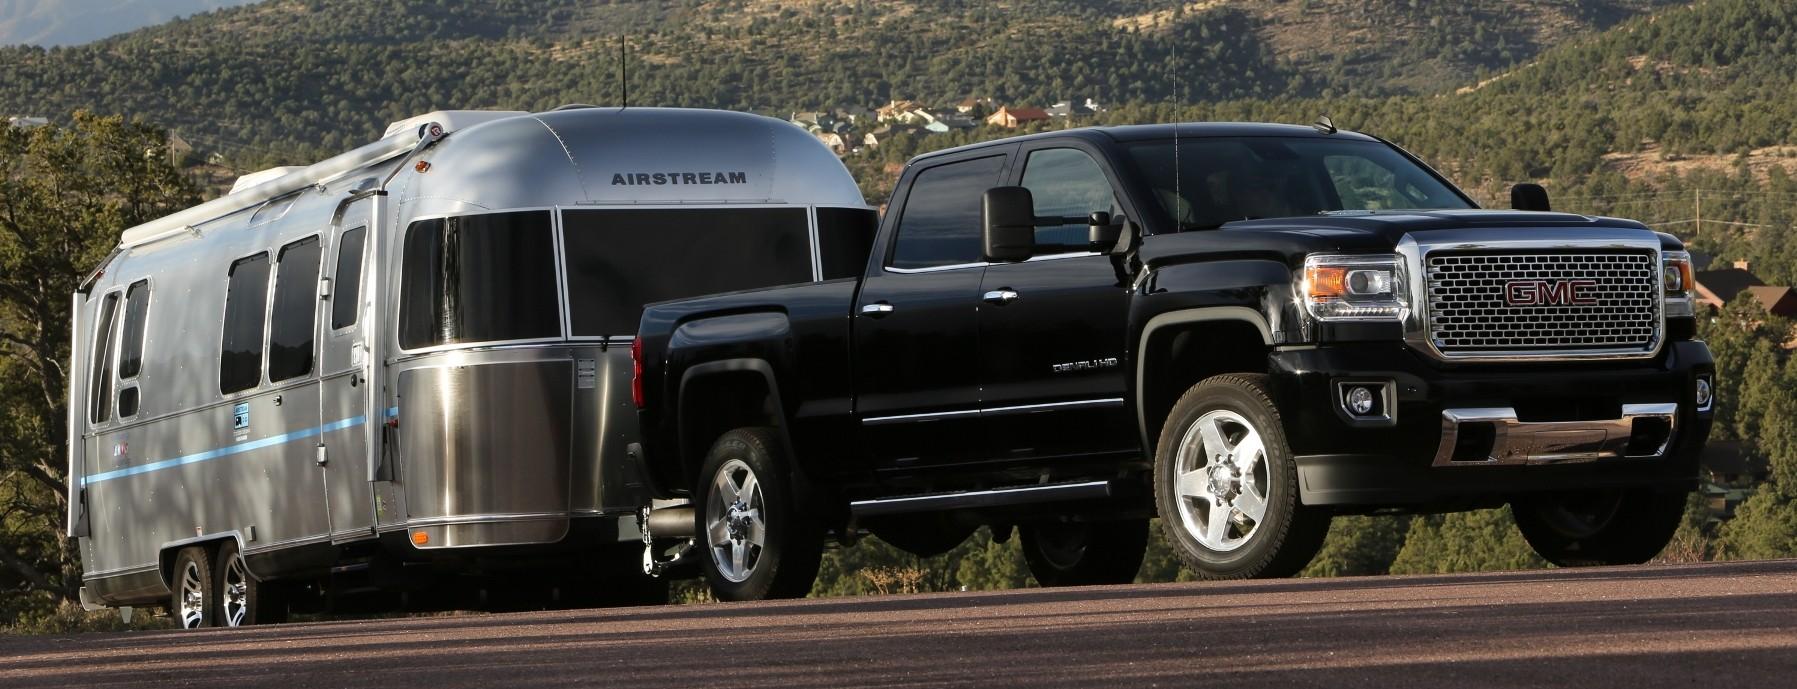 Dodge Dually Fenders For Sale Craigslist >> Craigslist Chevy 2500 Hd Lift Kit | Autos Post